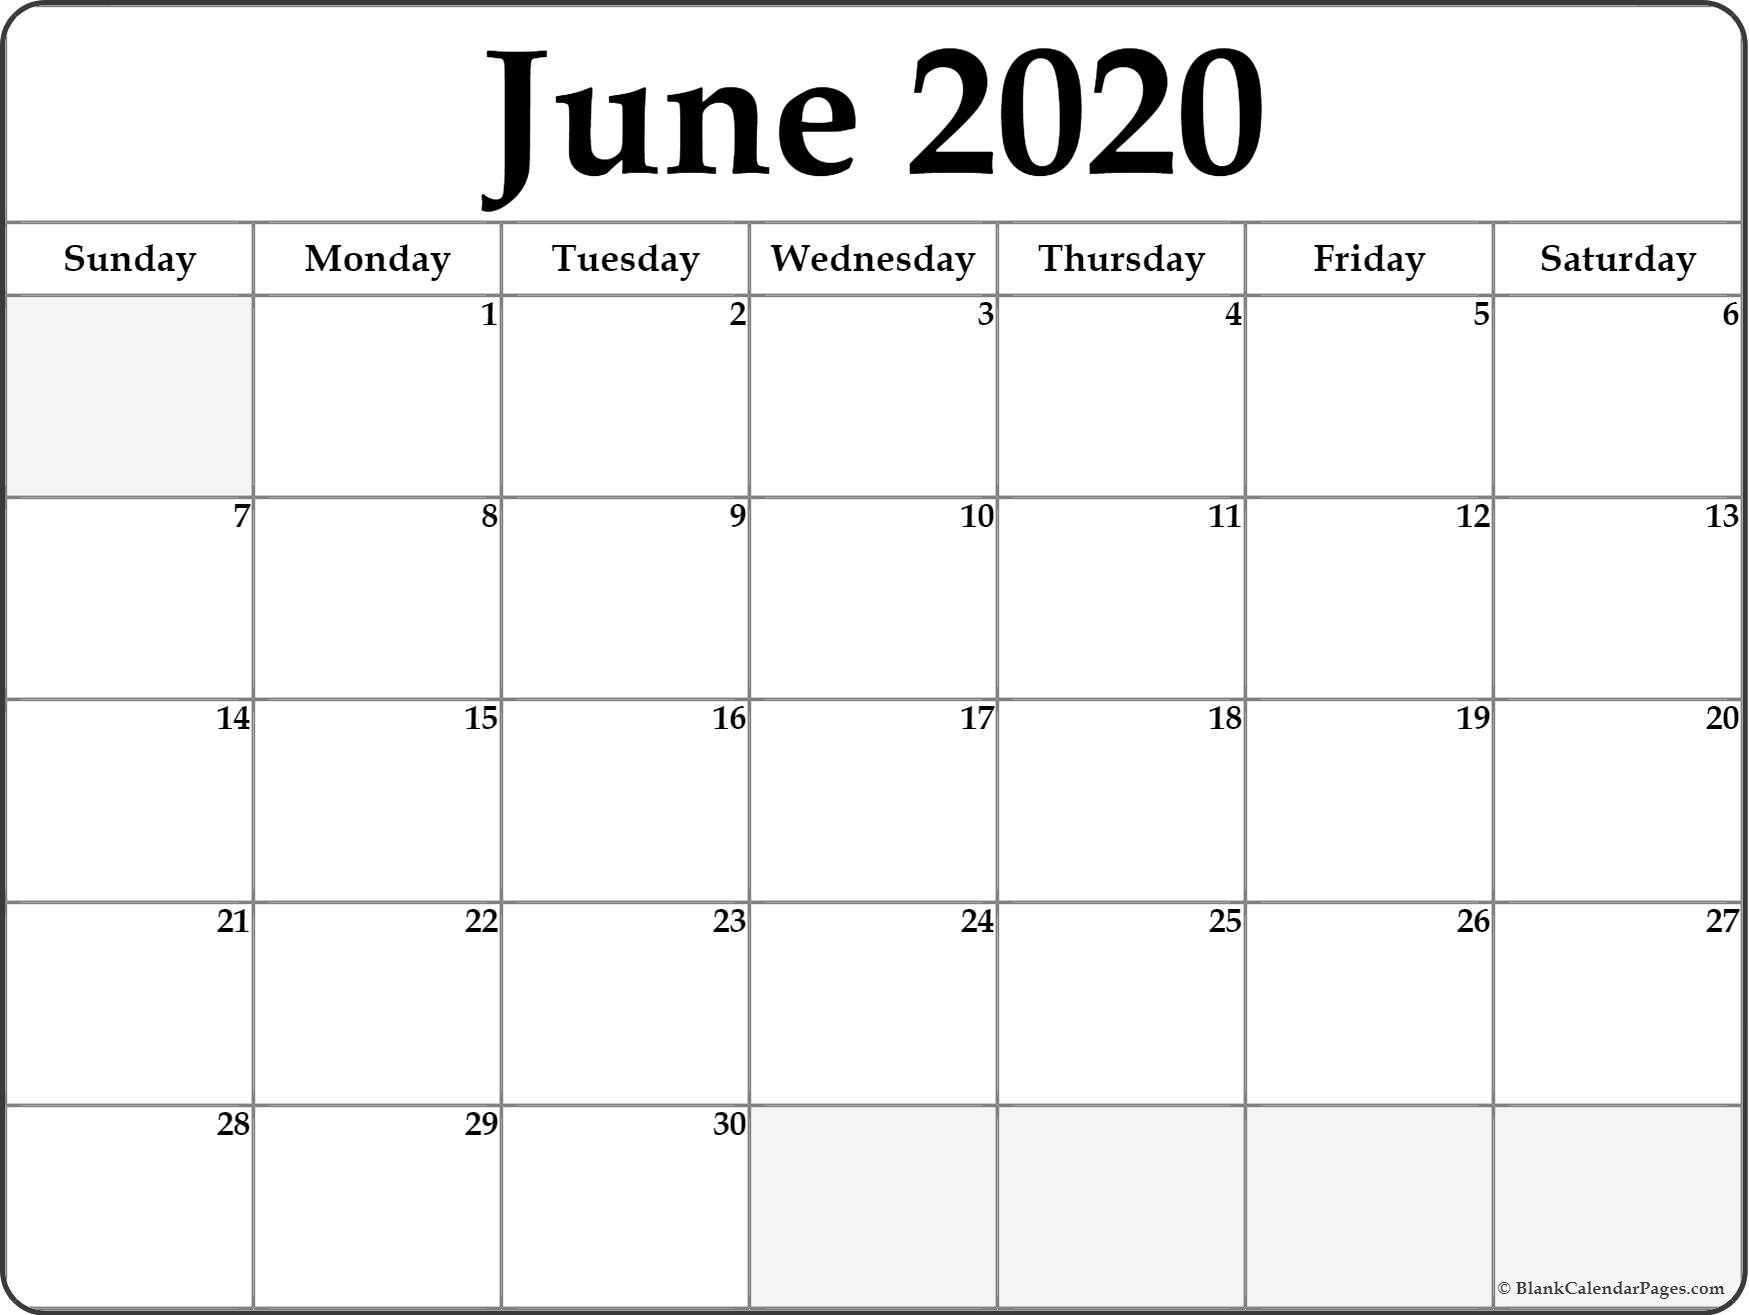 June 2020 Calendar | Free Printable Monthly Calendars regarding 2020 Calendar With Space To Write